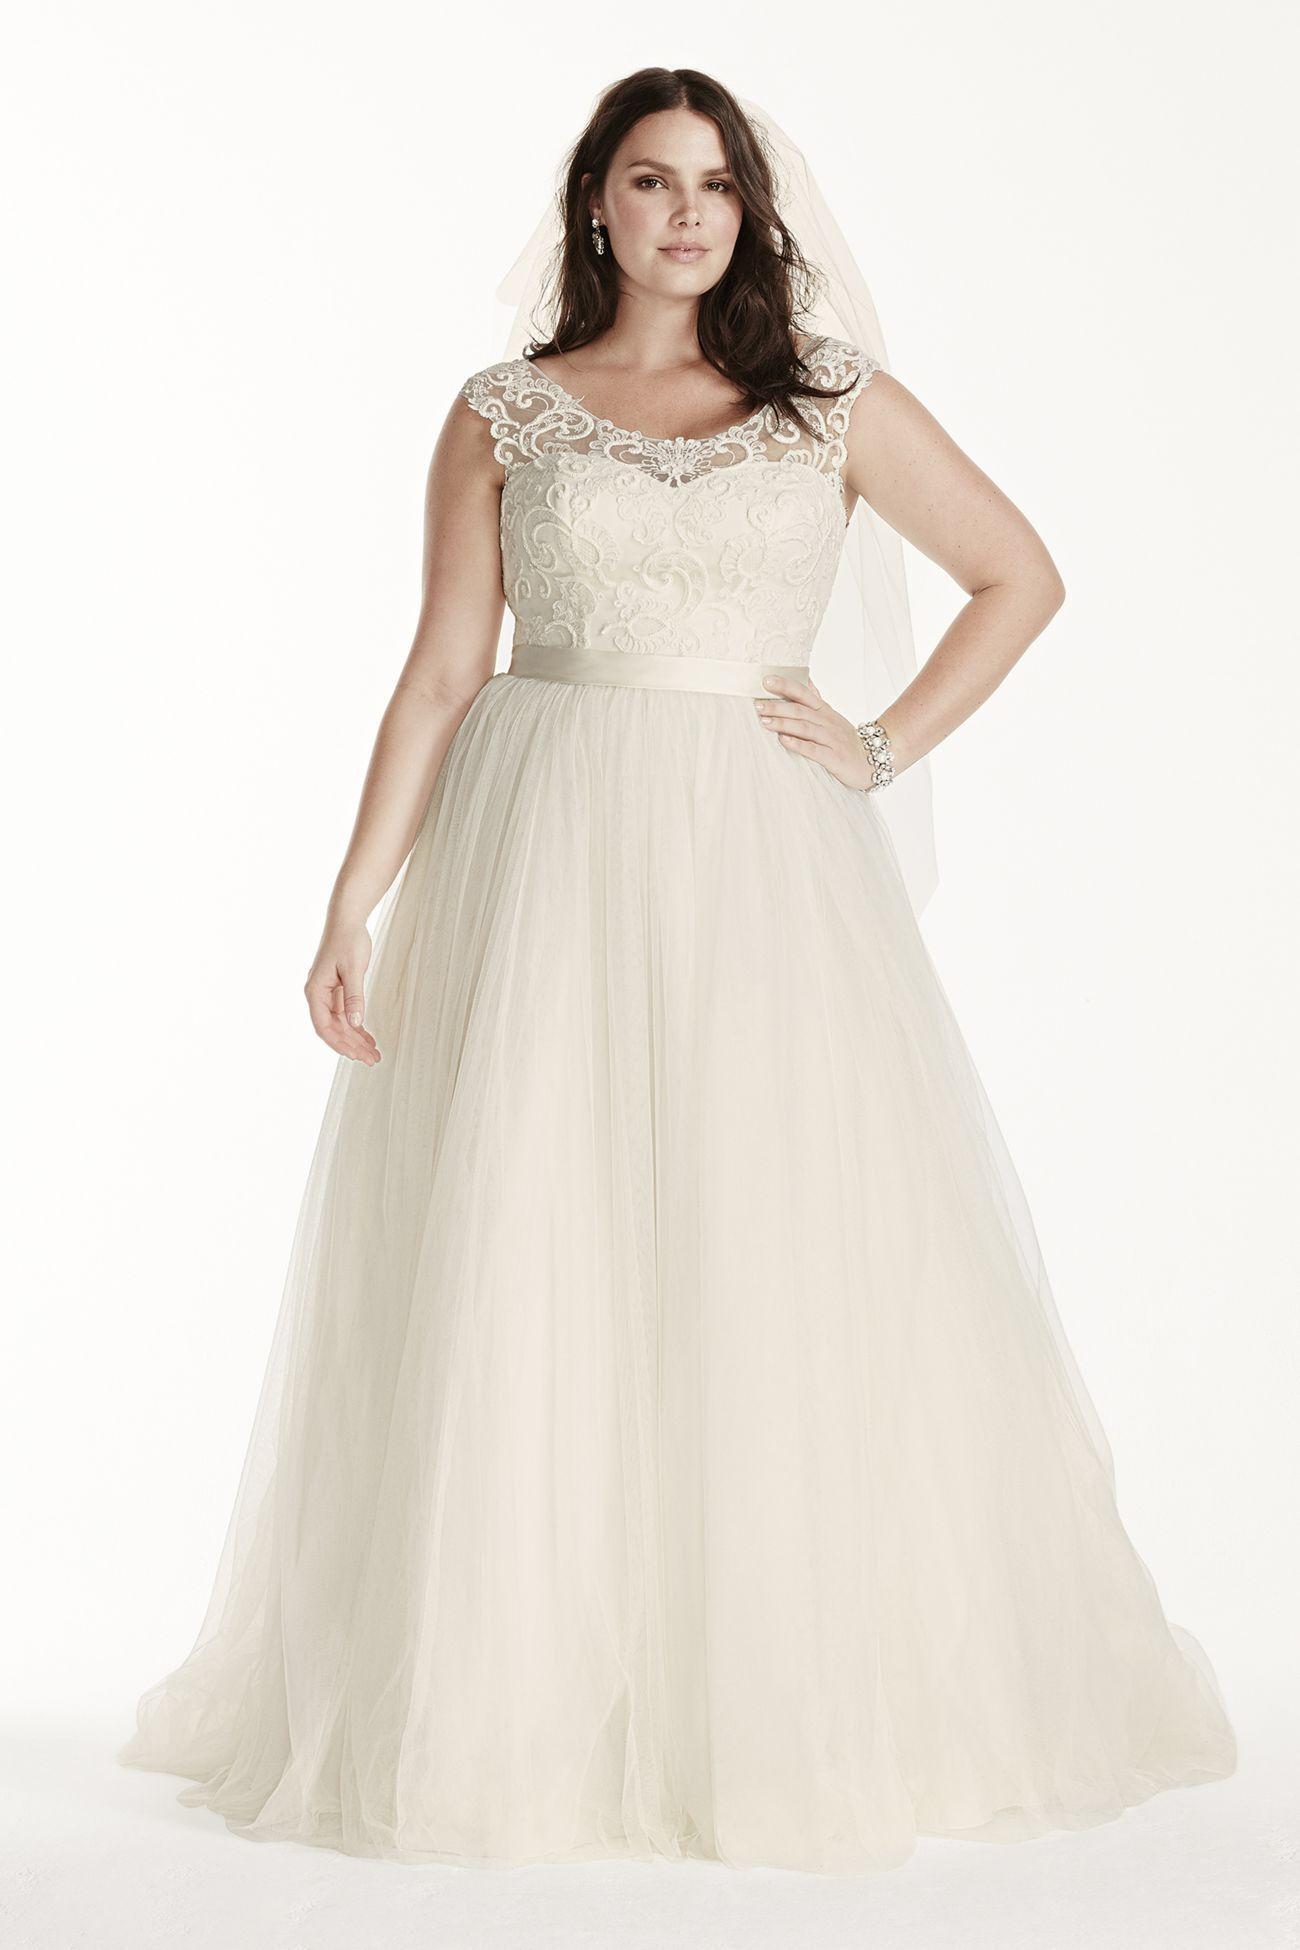 My New Favorite! www.davidsbridal.com/10414246 | Wedding | Pinterest ...